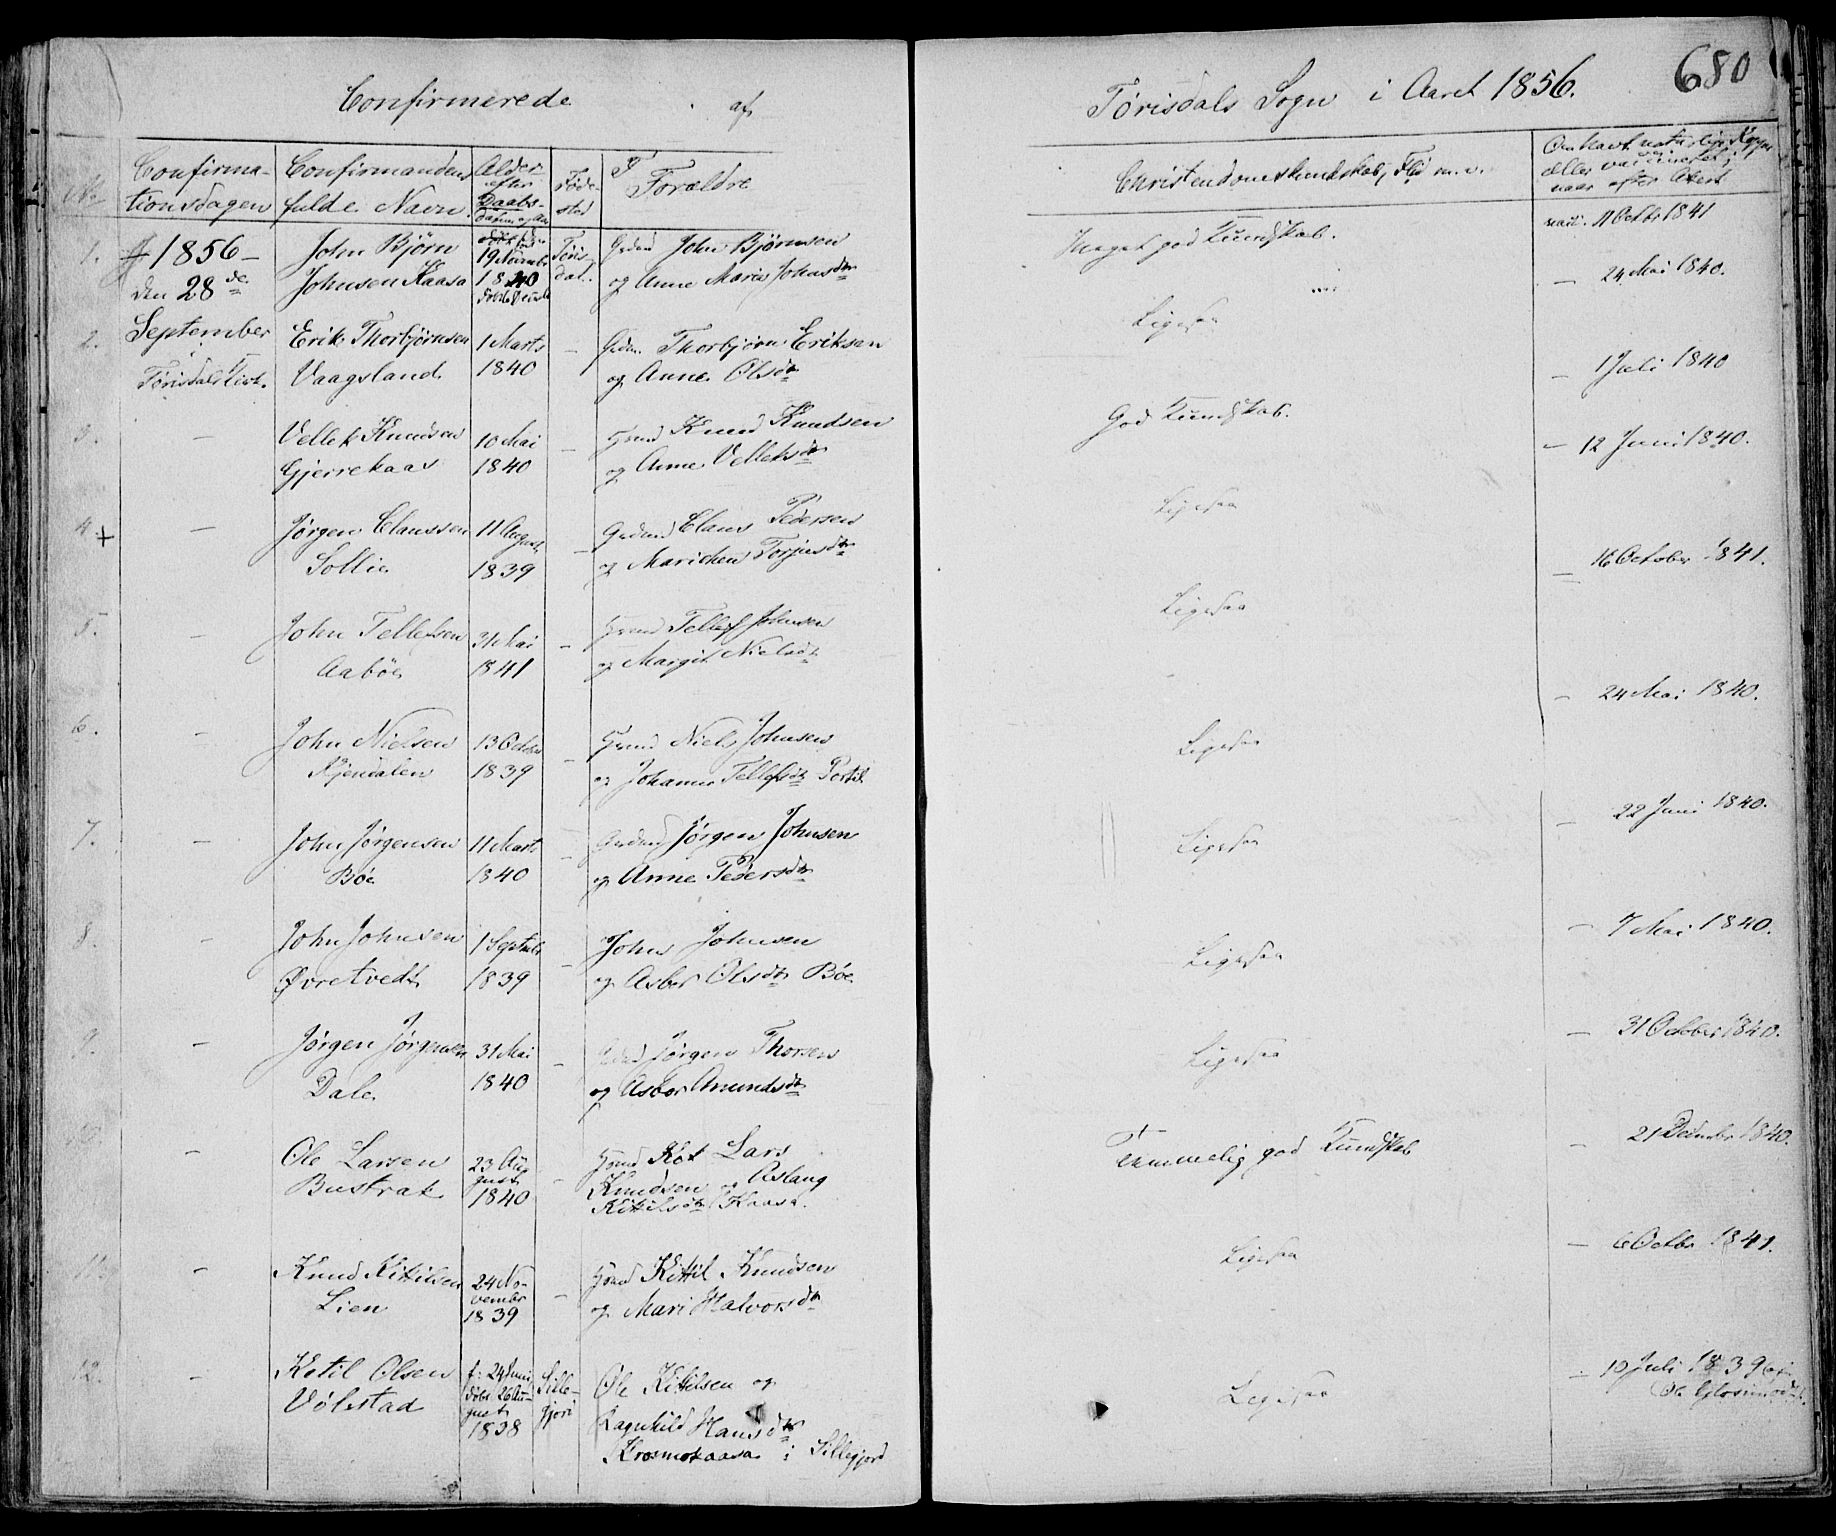 SAKO, Drangedal kirkebøker, F/Fa/L0007b: Ministerialbok nr. 7b, 1837-1856, s. 680